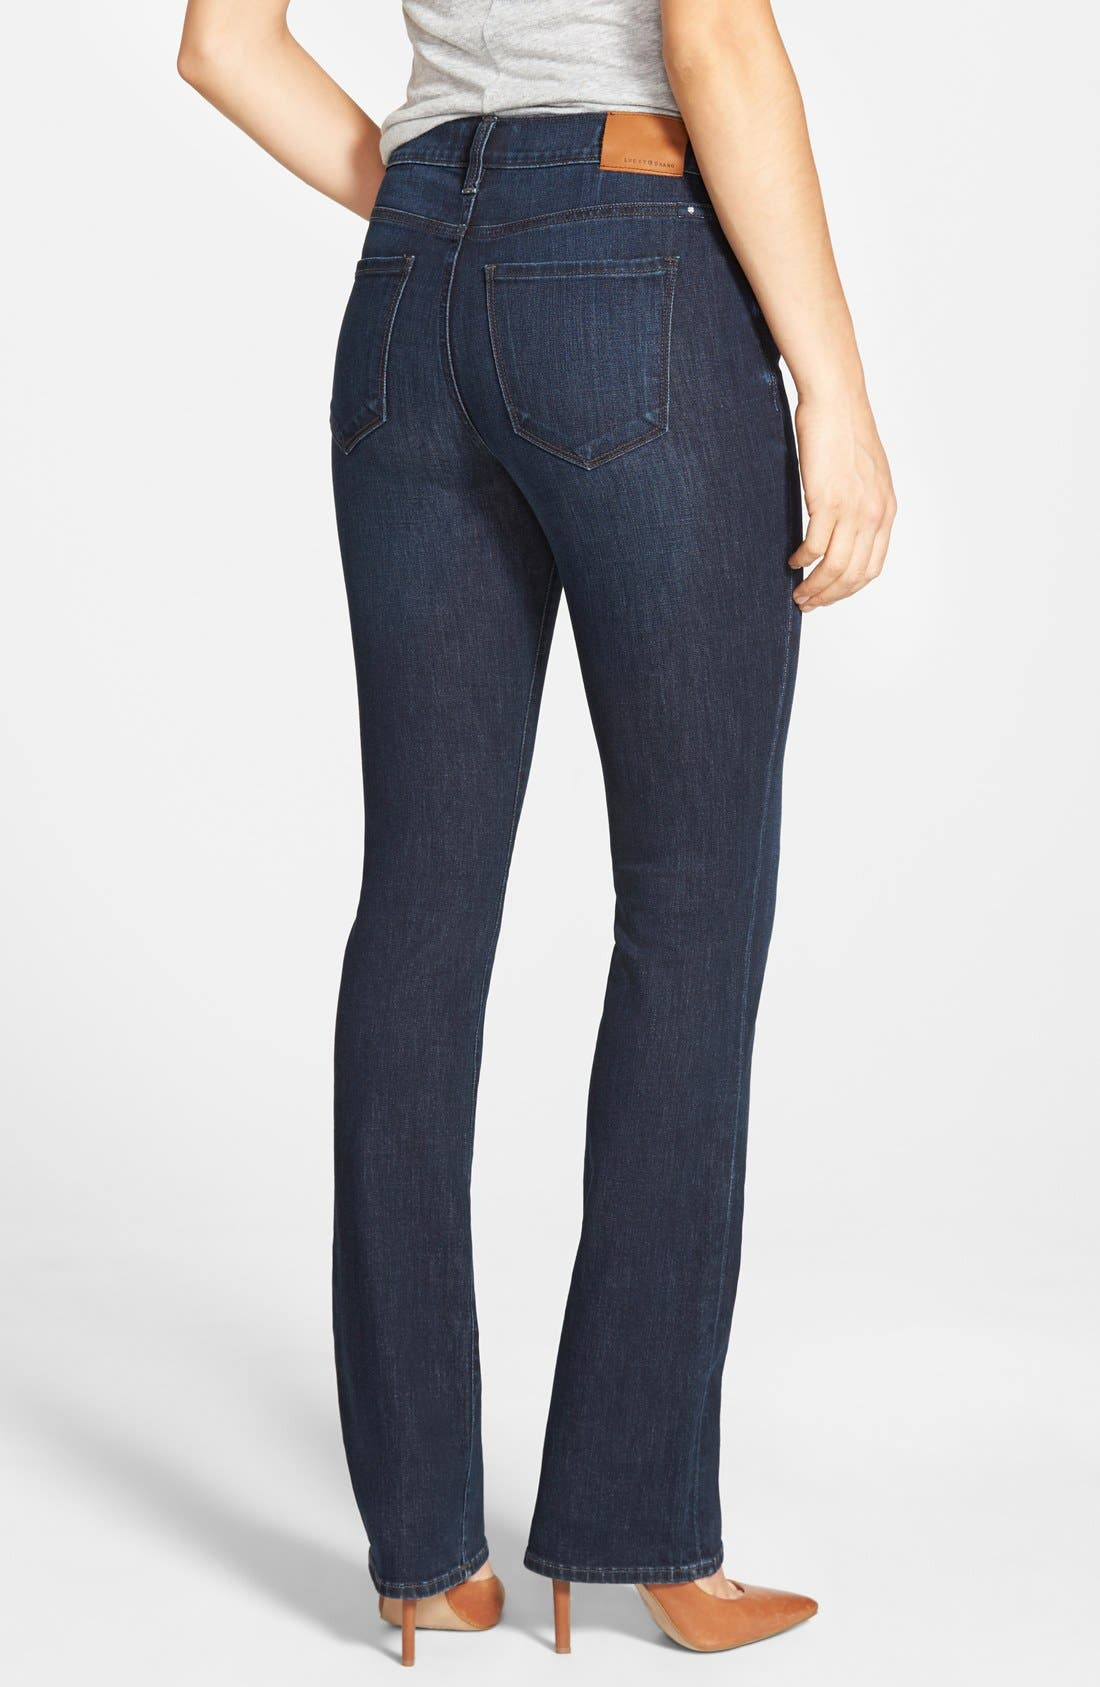 Alternate Image 2  - Lucky Brand 'Brooke' Stretch Bootcut Jeans (Serpantine)